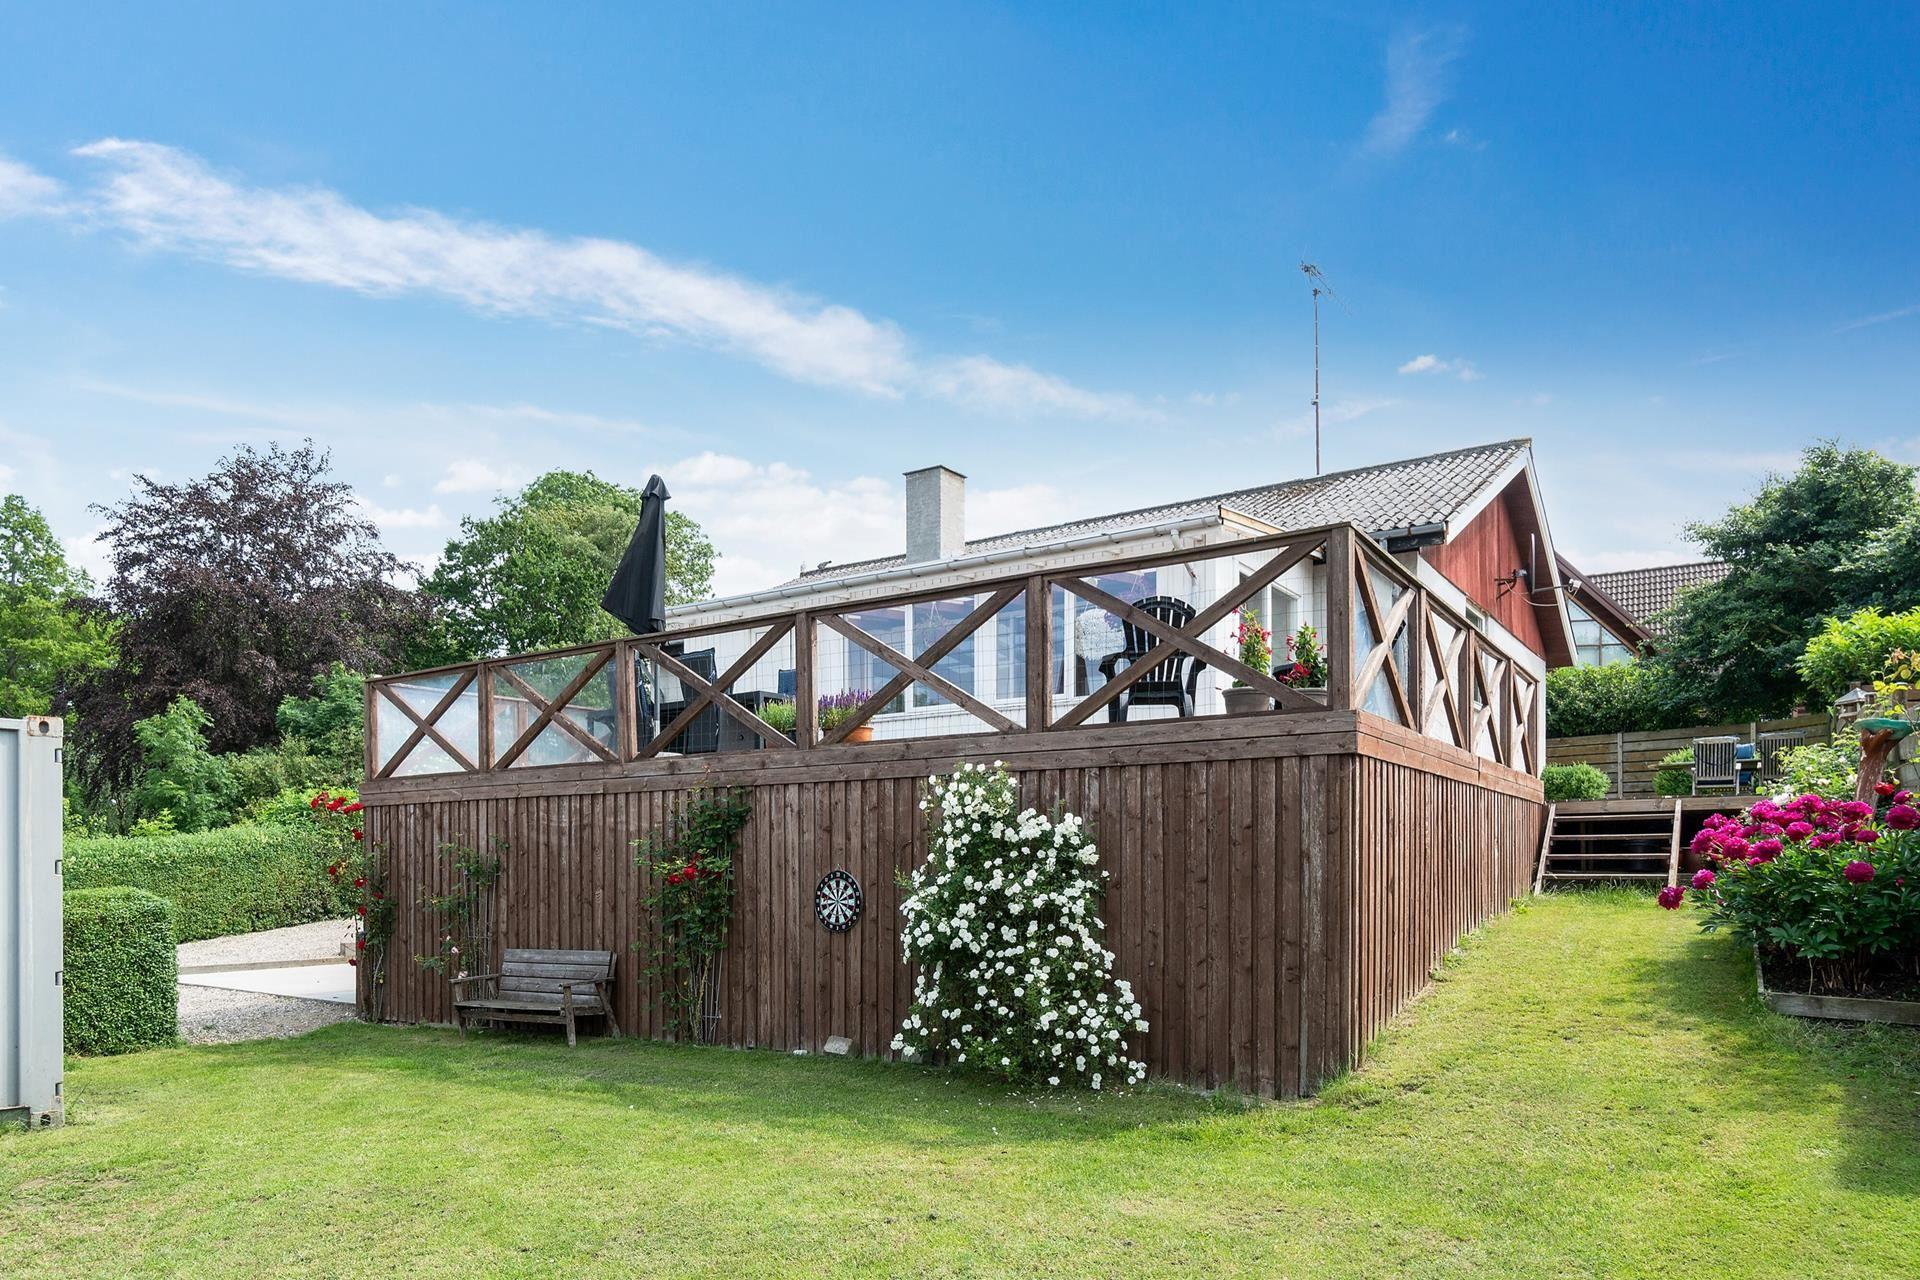 Gl Nykøbingvej 12, 4560 Vig